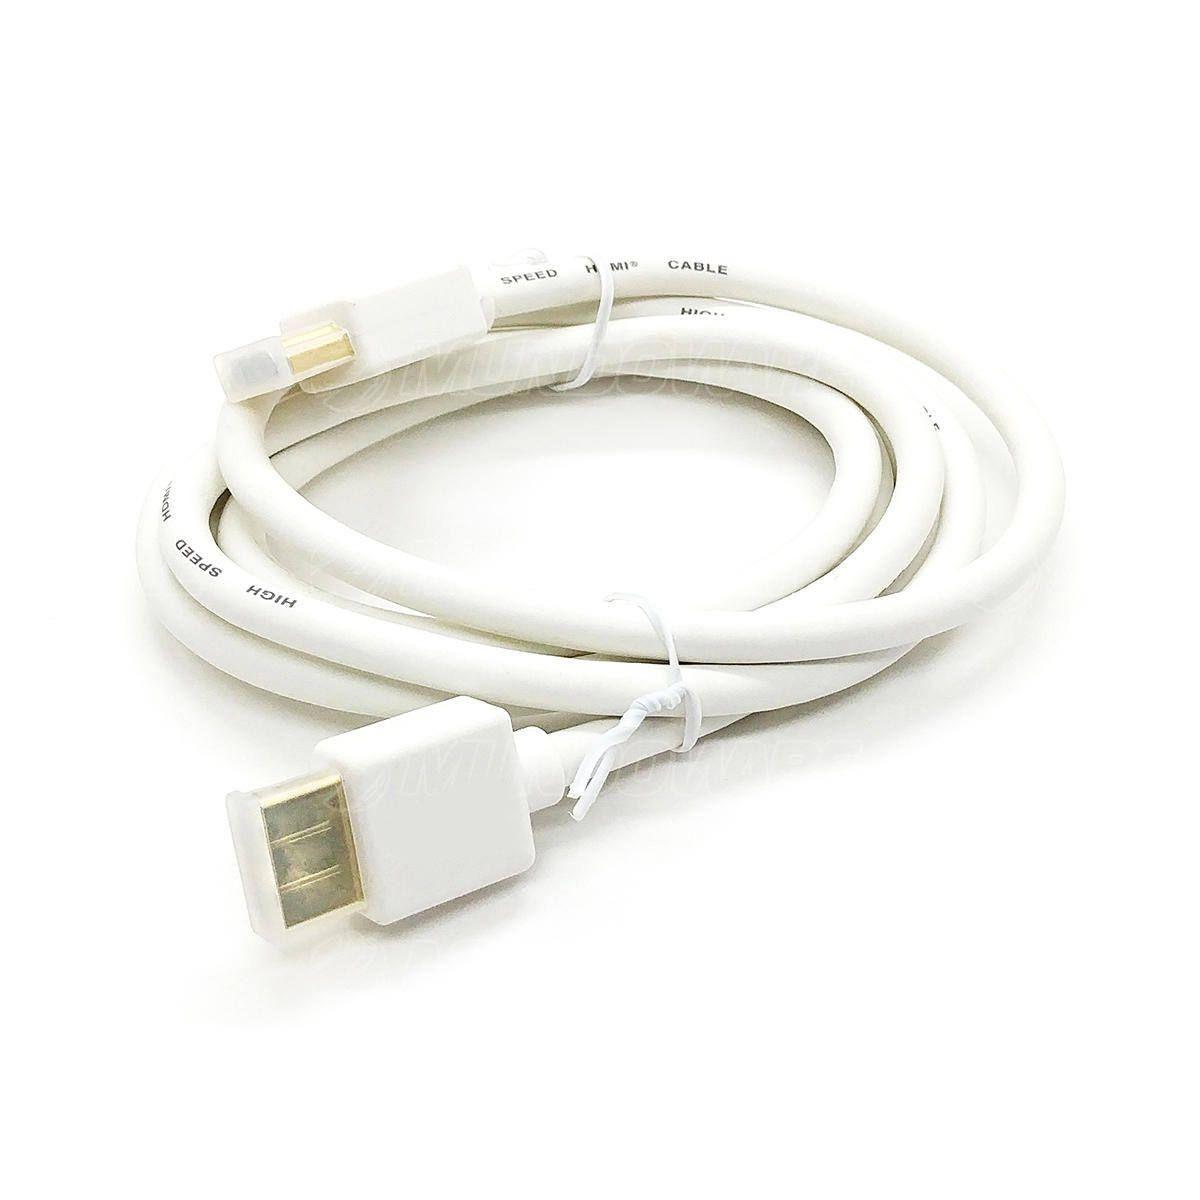 Cabo HDMI 4K UHD v2.0 19 Pinos Blindado 1.5 metros Branco Exbom CBX-H15DSM